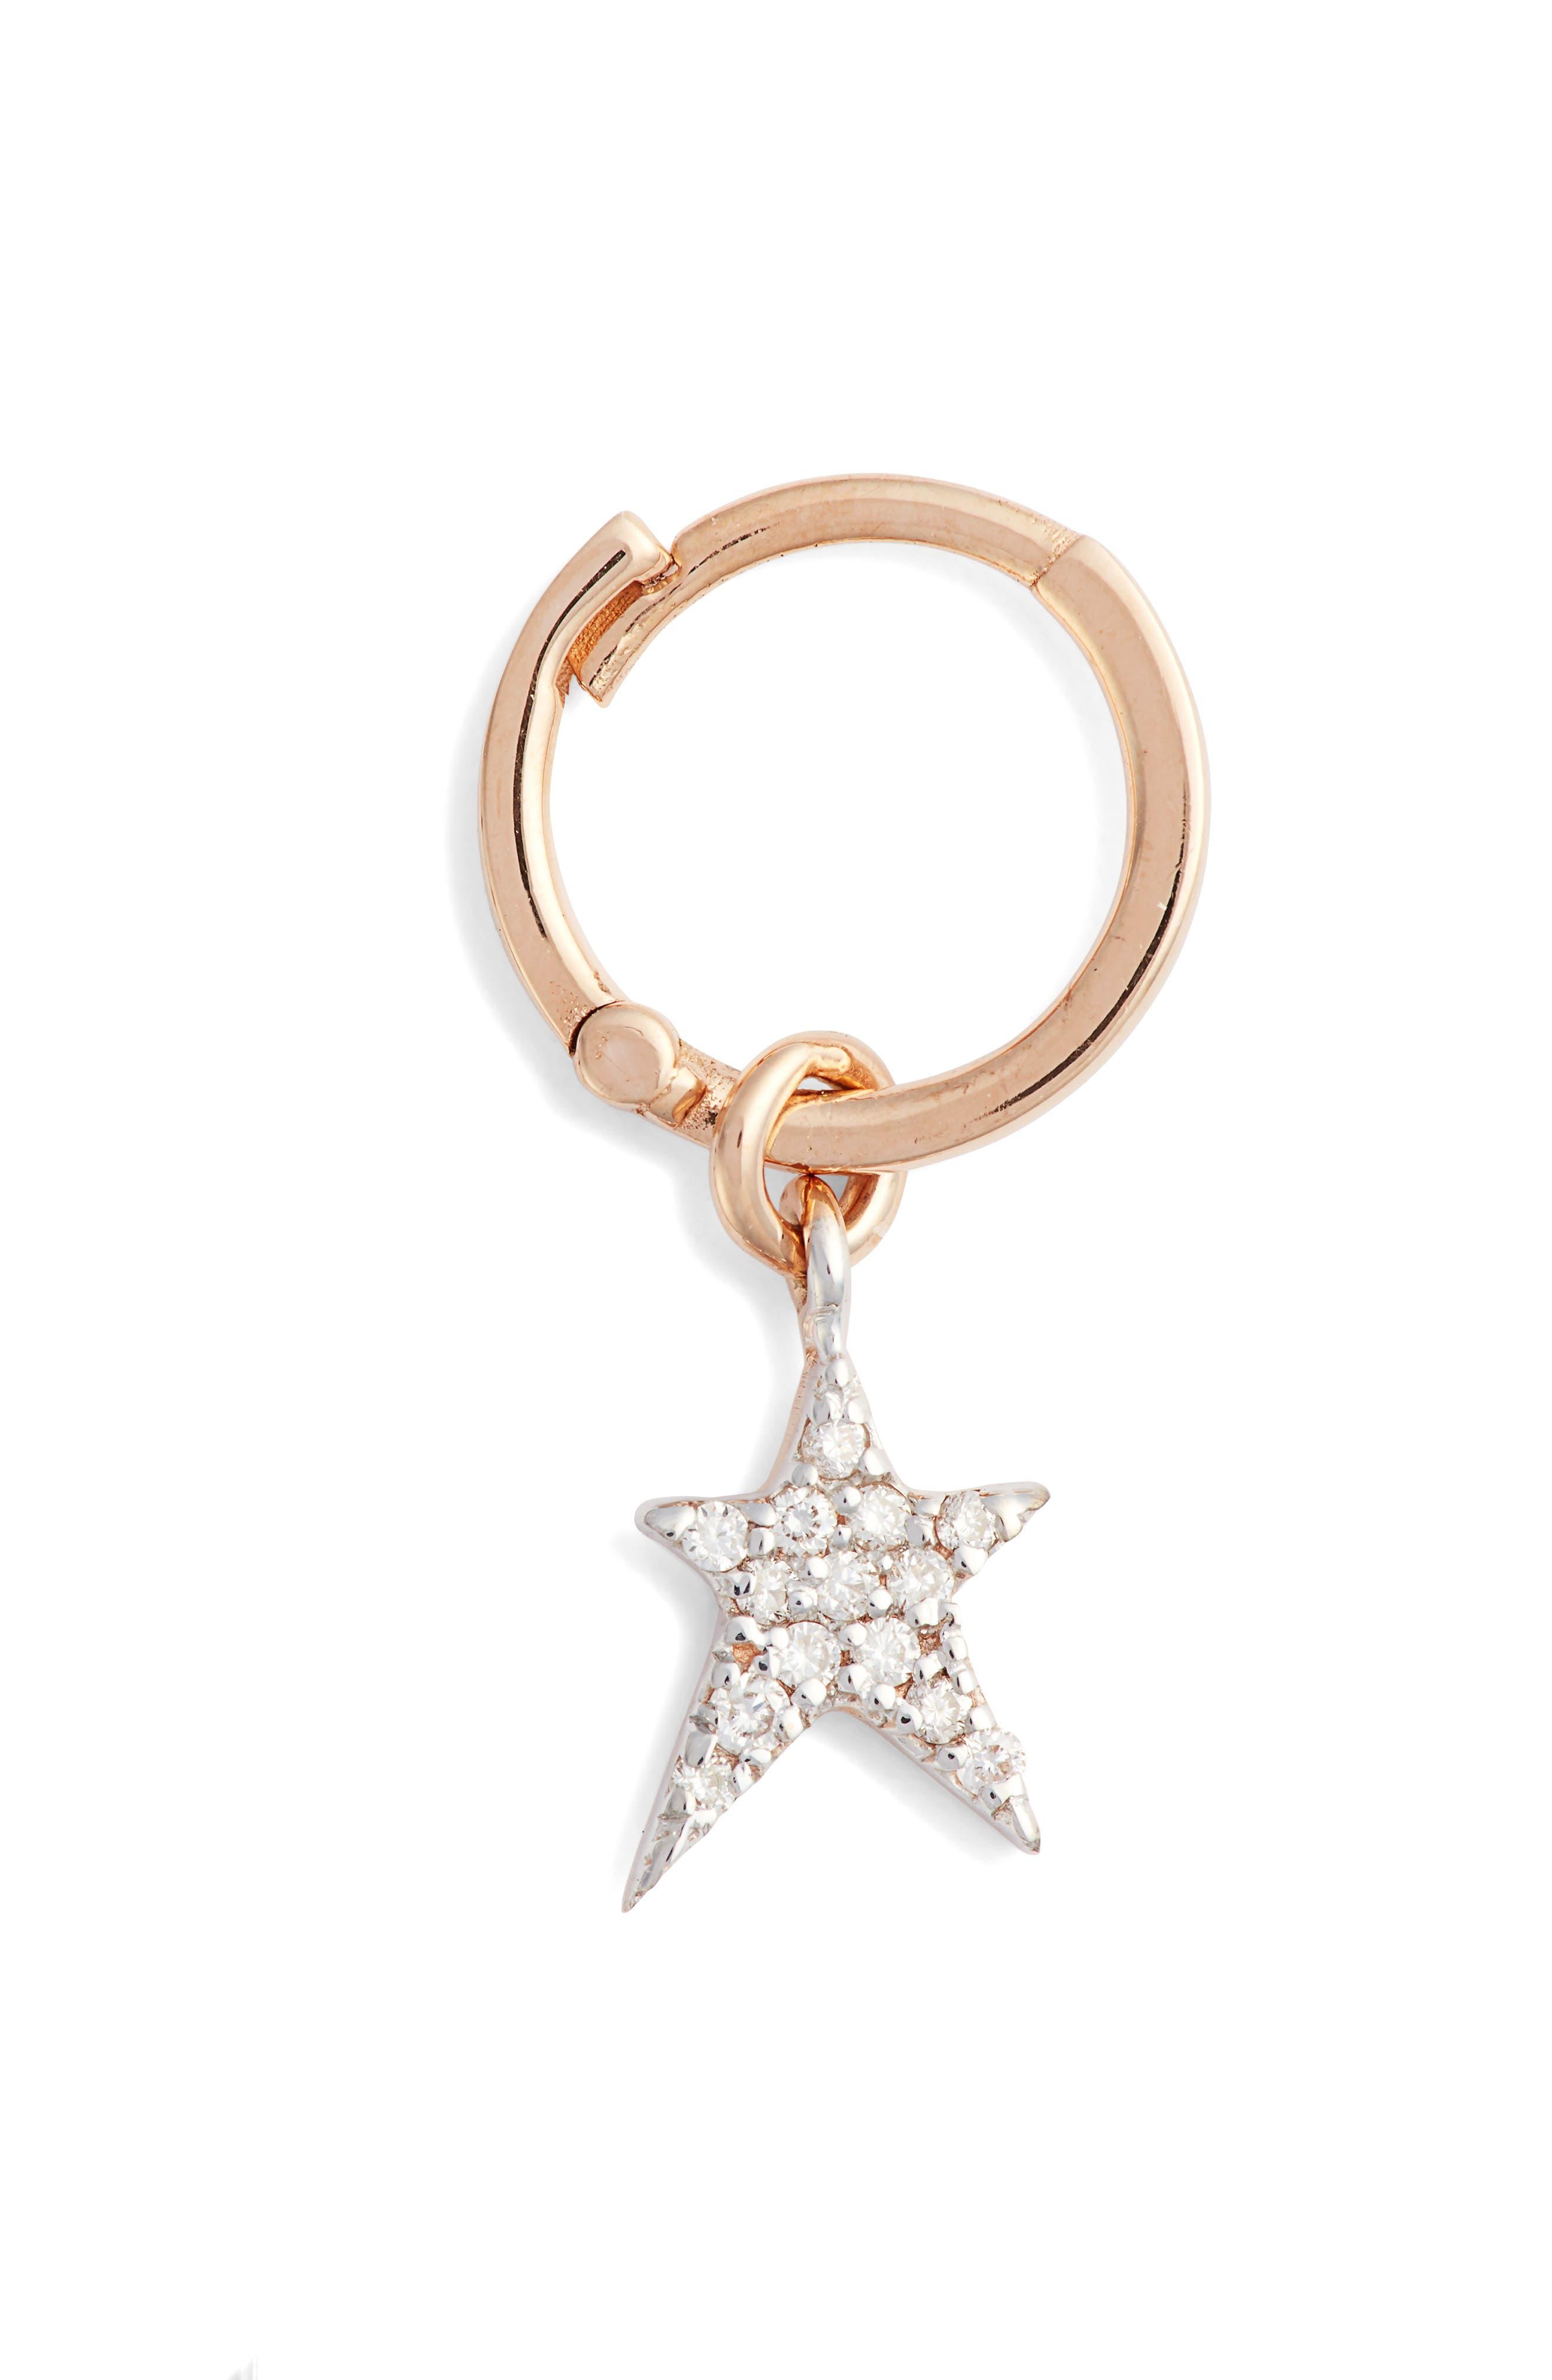 KISMET BY MILKA, Diamond Starstruck Small Hoop Earring, Main thumbnail 1, color, ROSE GOLD